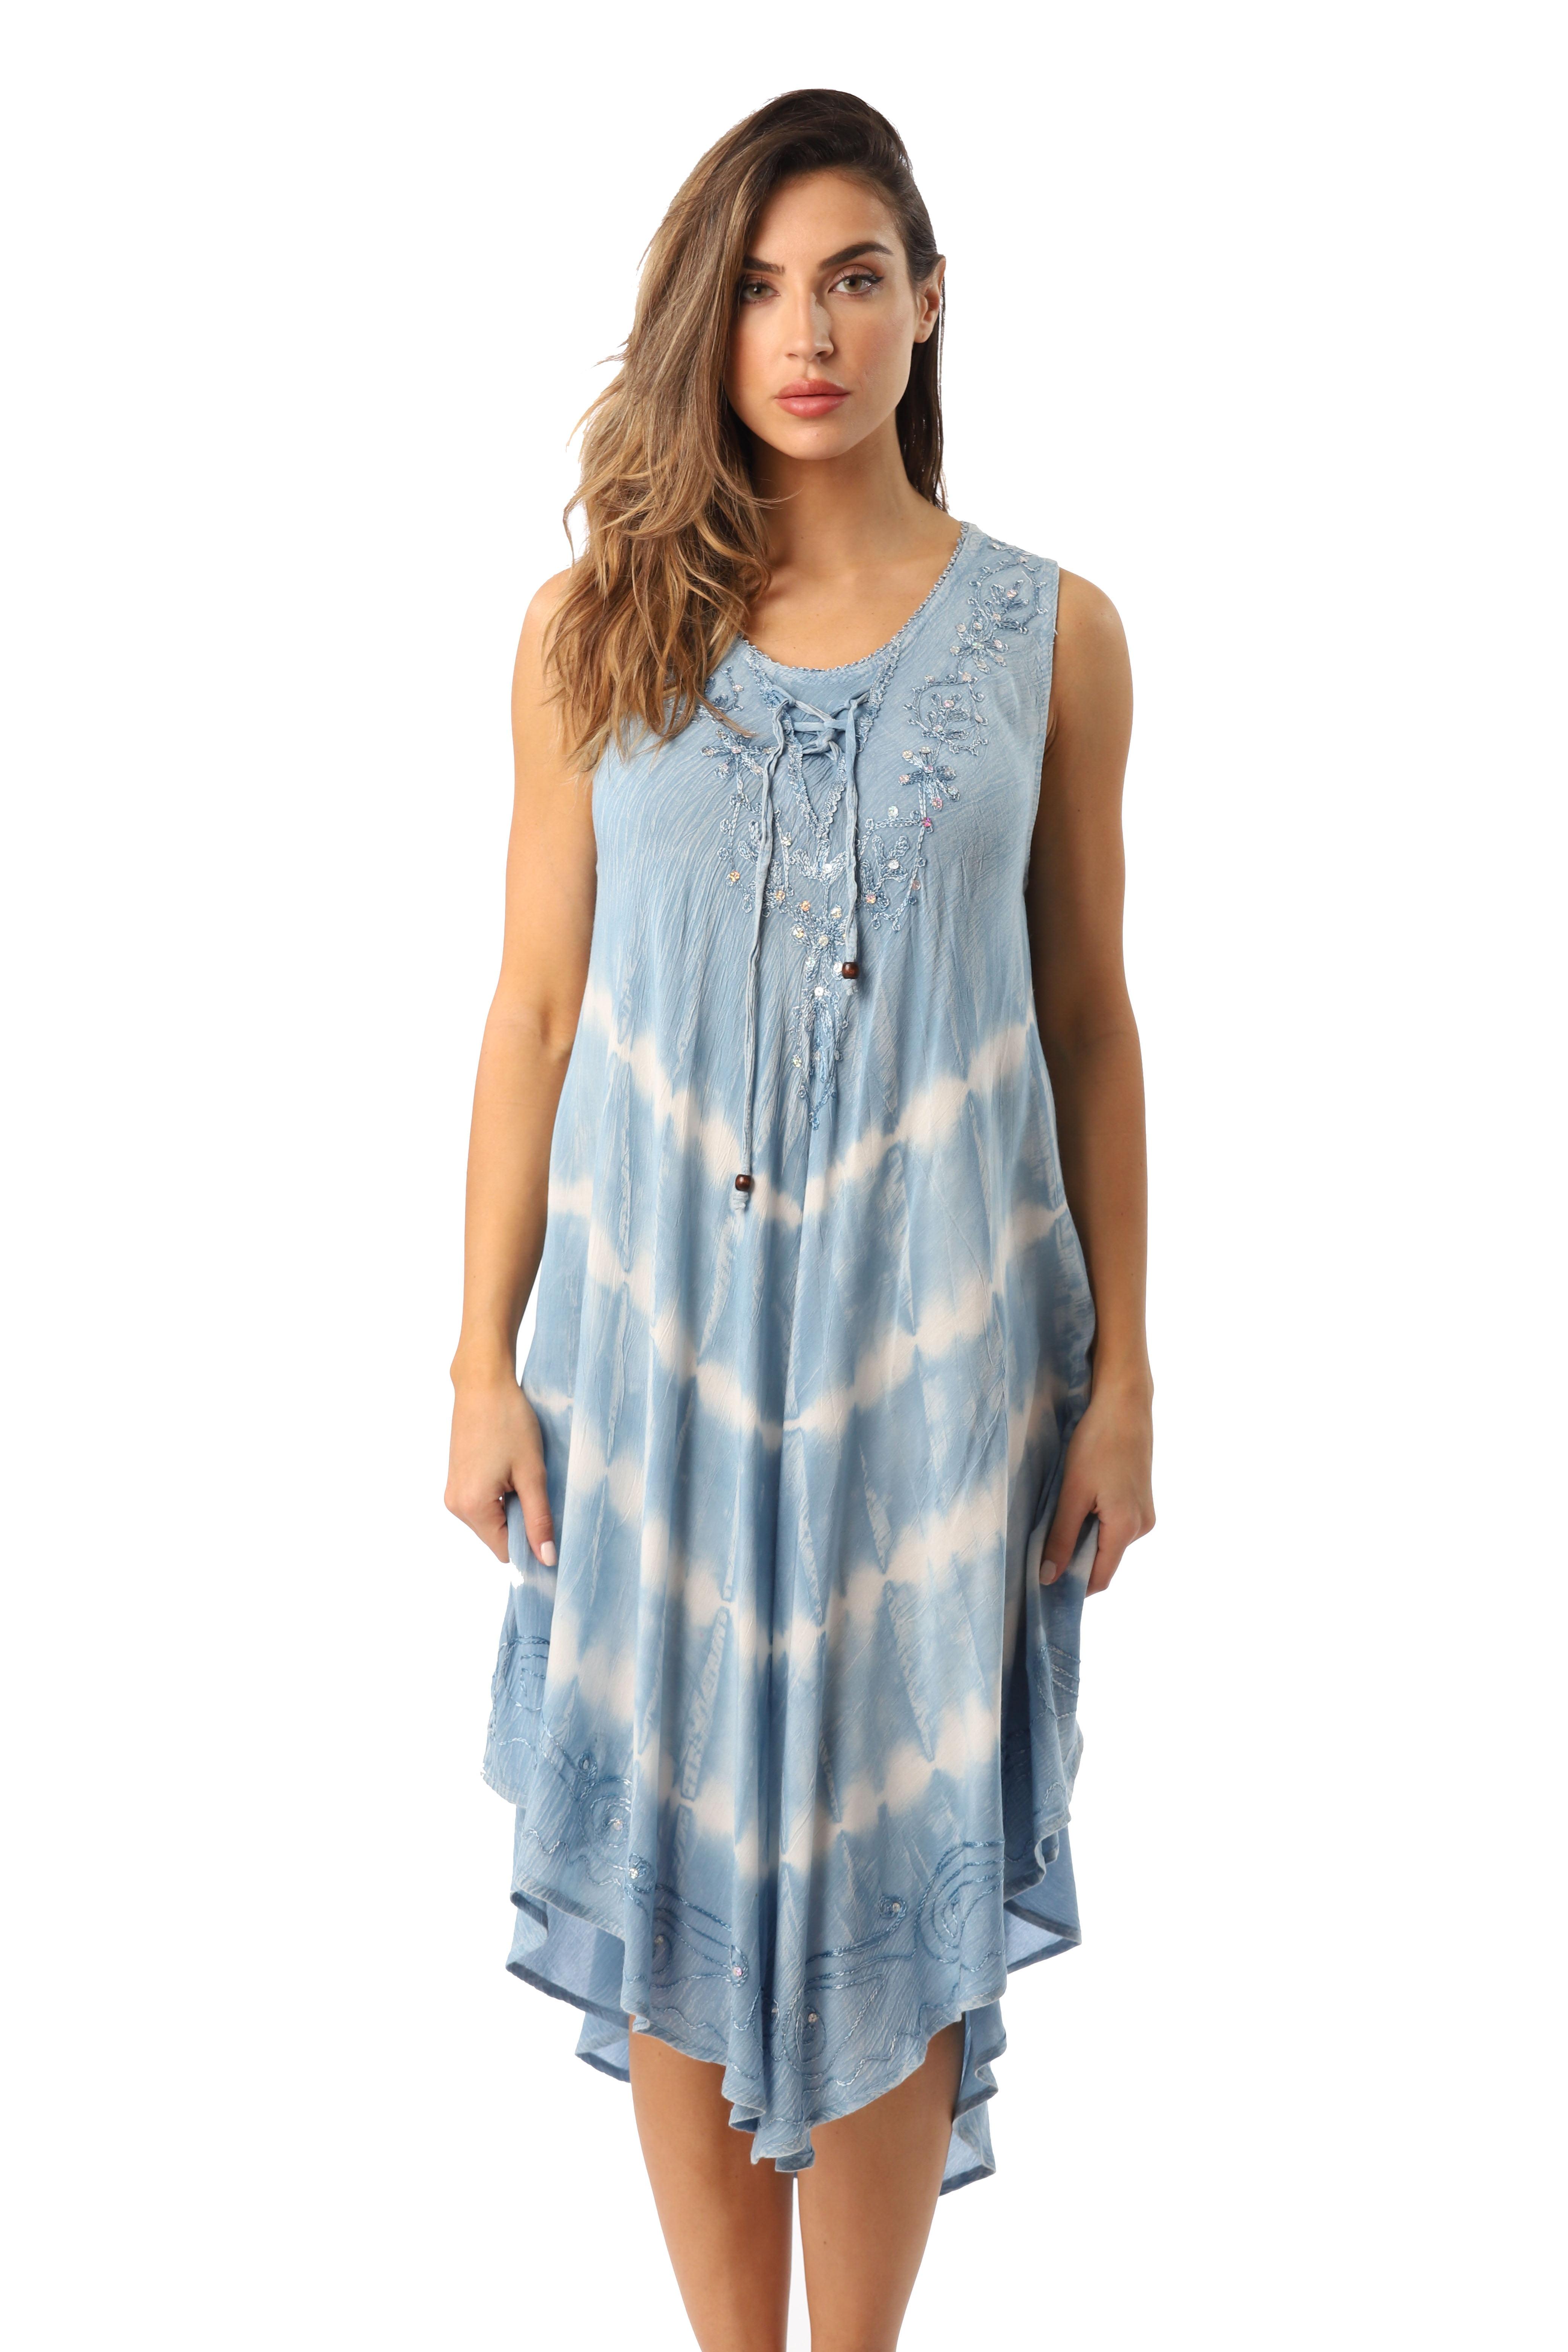 LAffair Ladies Umbrella Cut Maternity Pregnancy Floral Print Sleeveless Lightweight Casual Beach Summer Dress